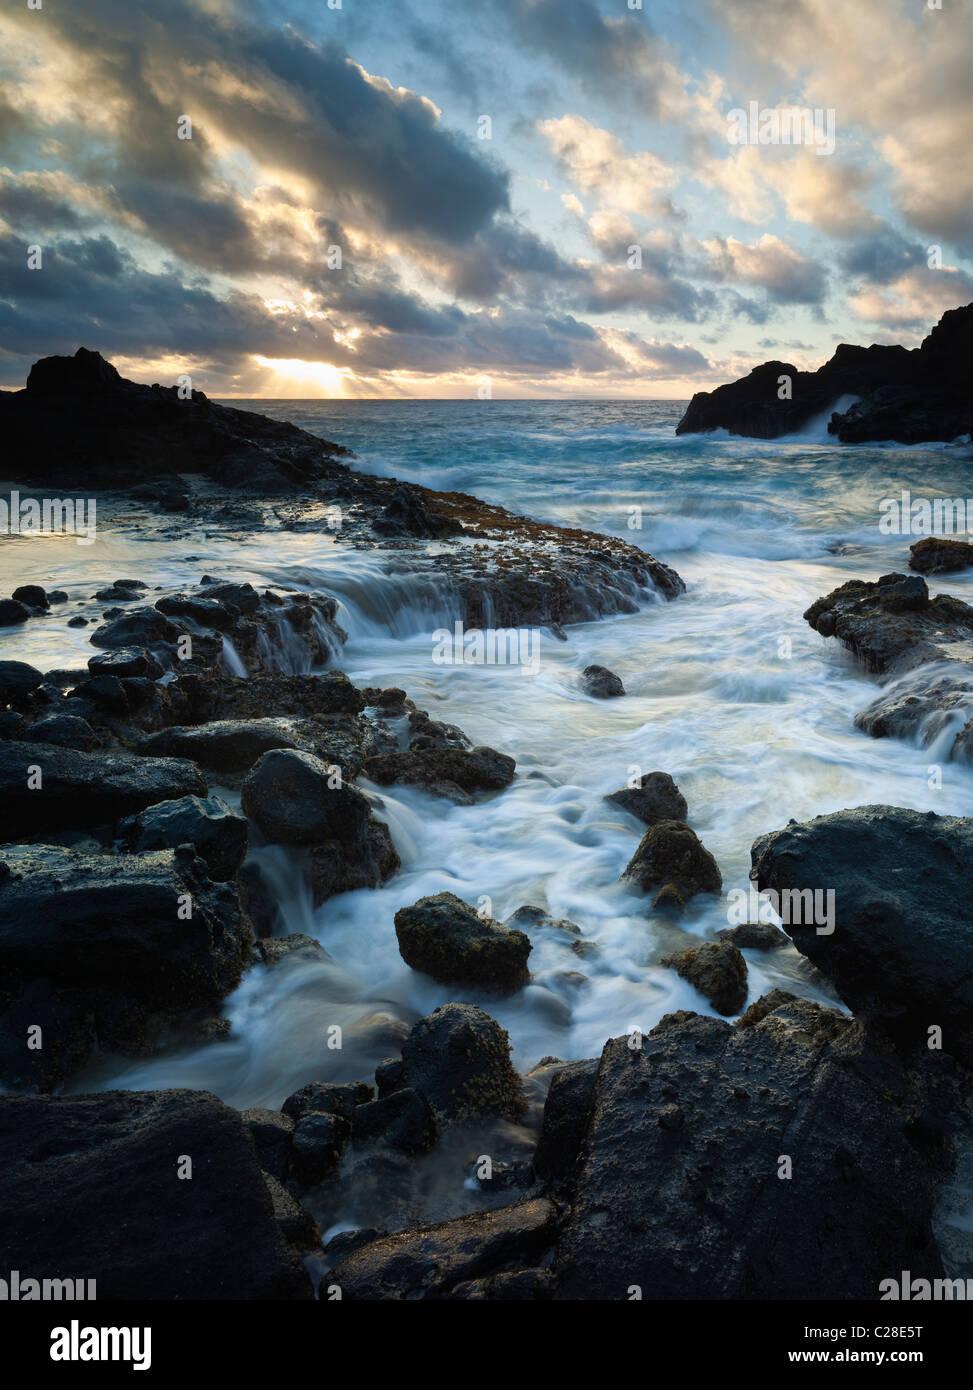 Halona Cove sunrise, Eastern coastline of Oahu, Hawaii - Stock Image